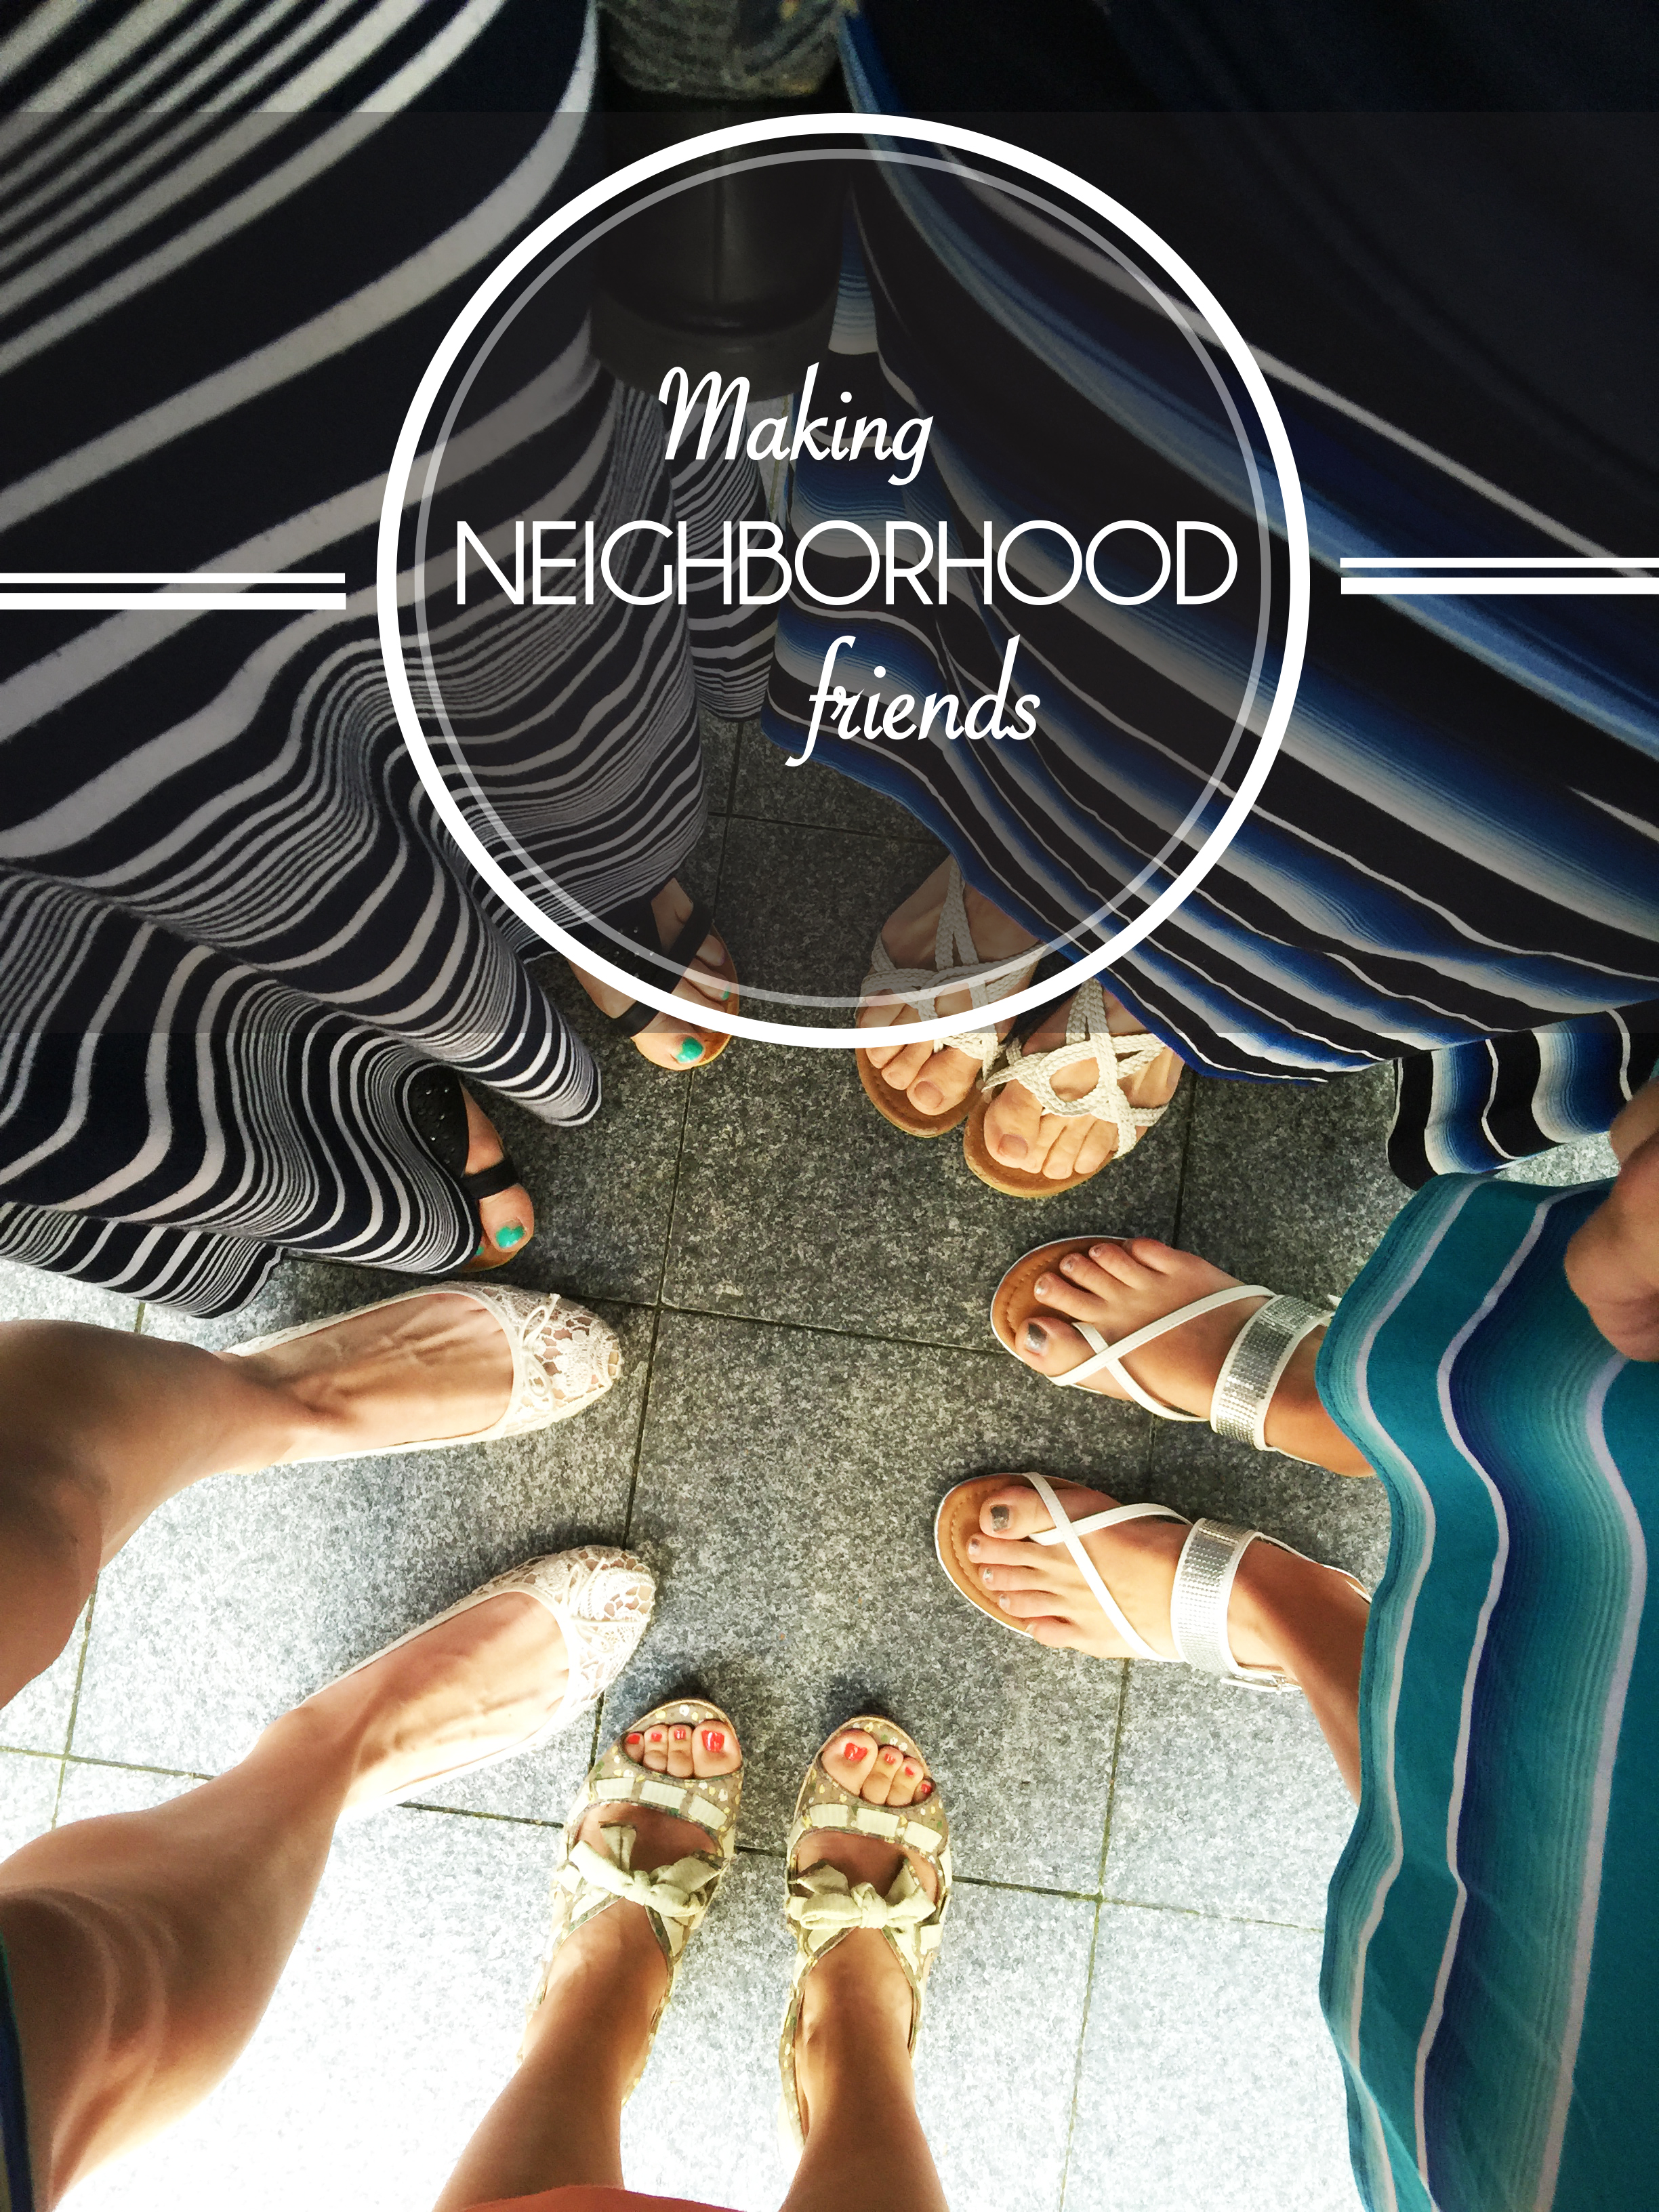 Making Neighborhood Friends